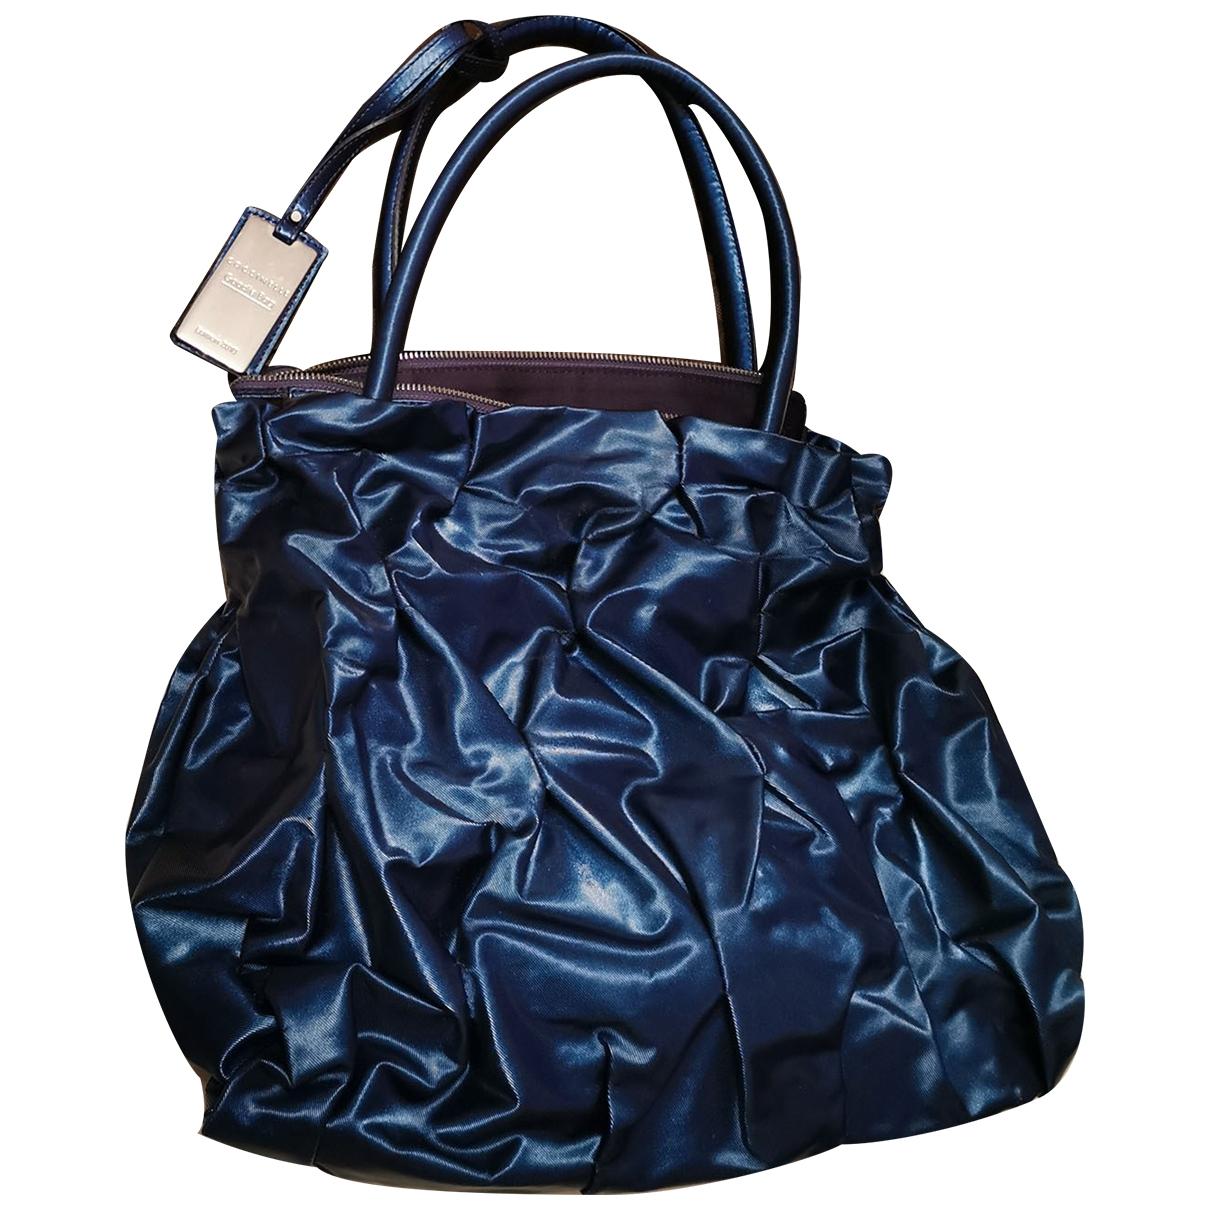 Coccinelle \N Blue handbag for Women \N